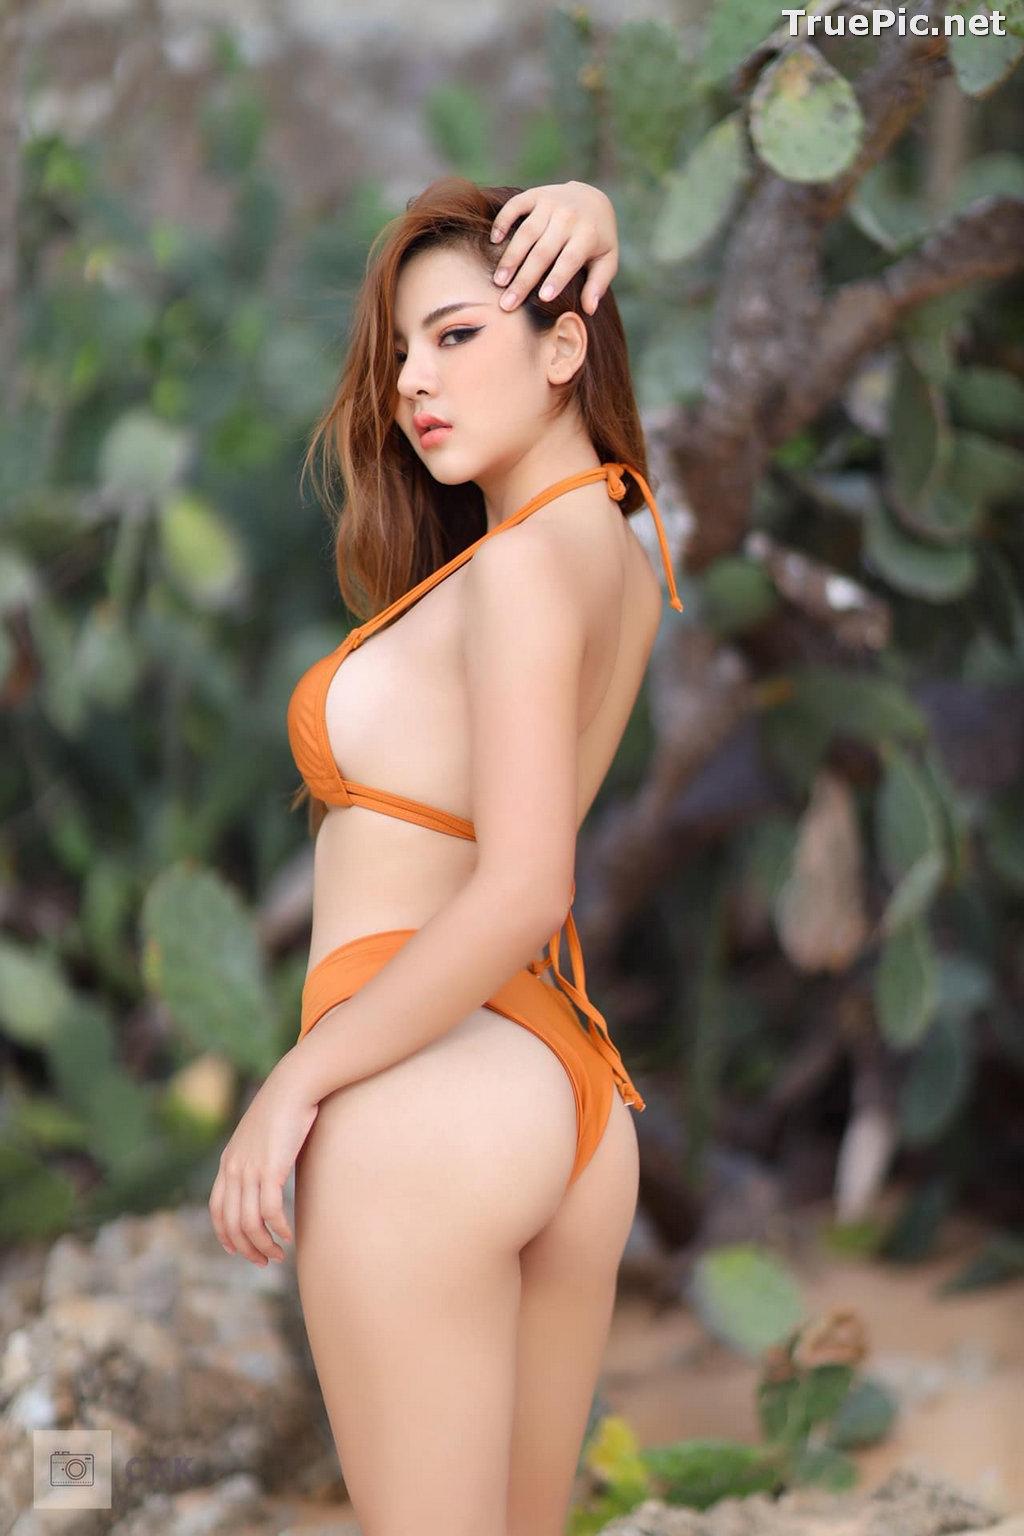 Image Thailand Model - Montakan Kaengraeng - Sexy Orange Bikini - TruePic.net - Picture-1